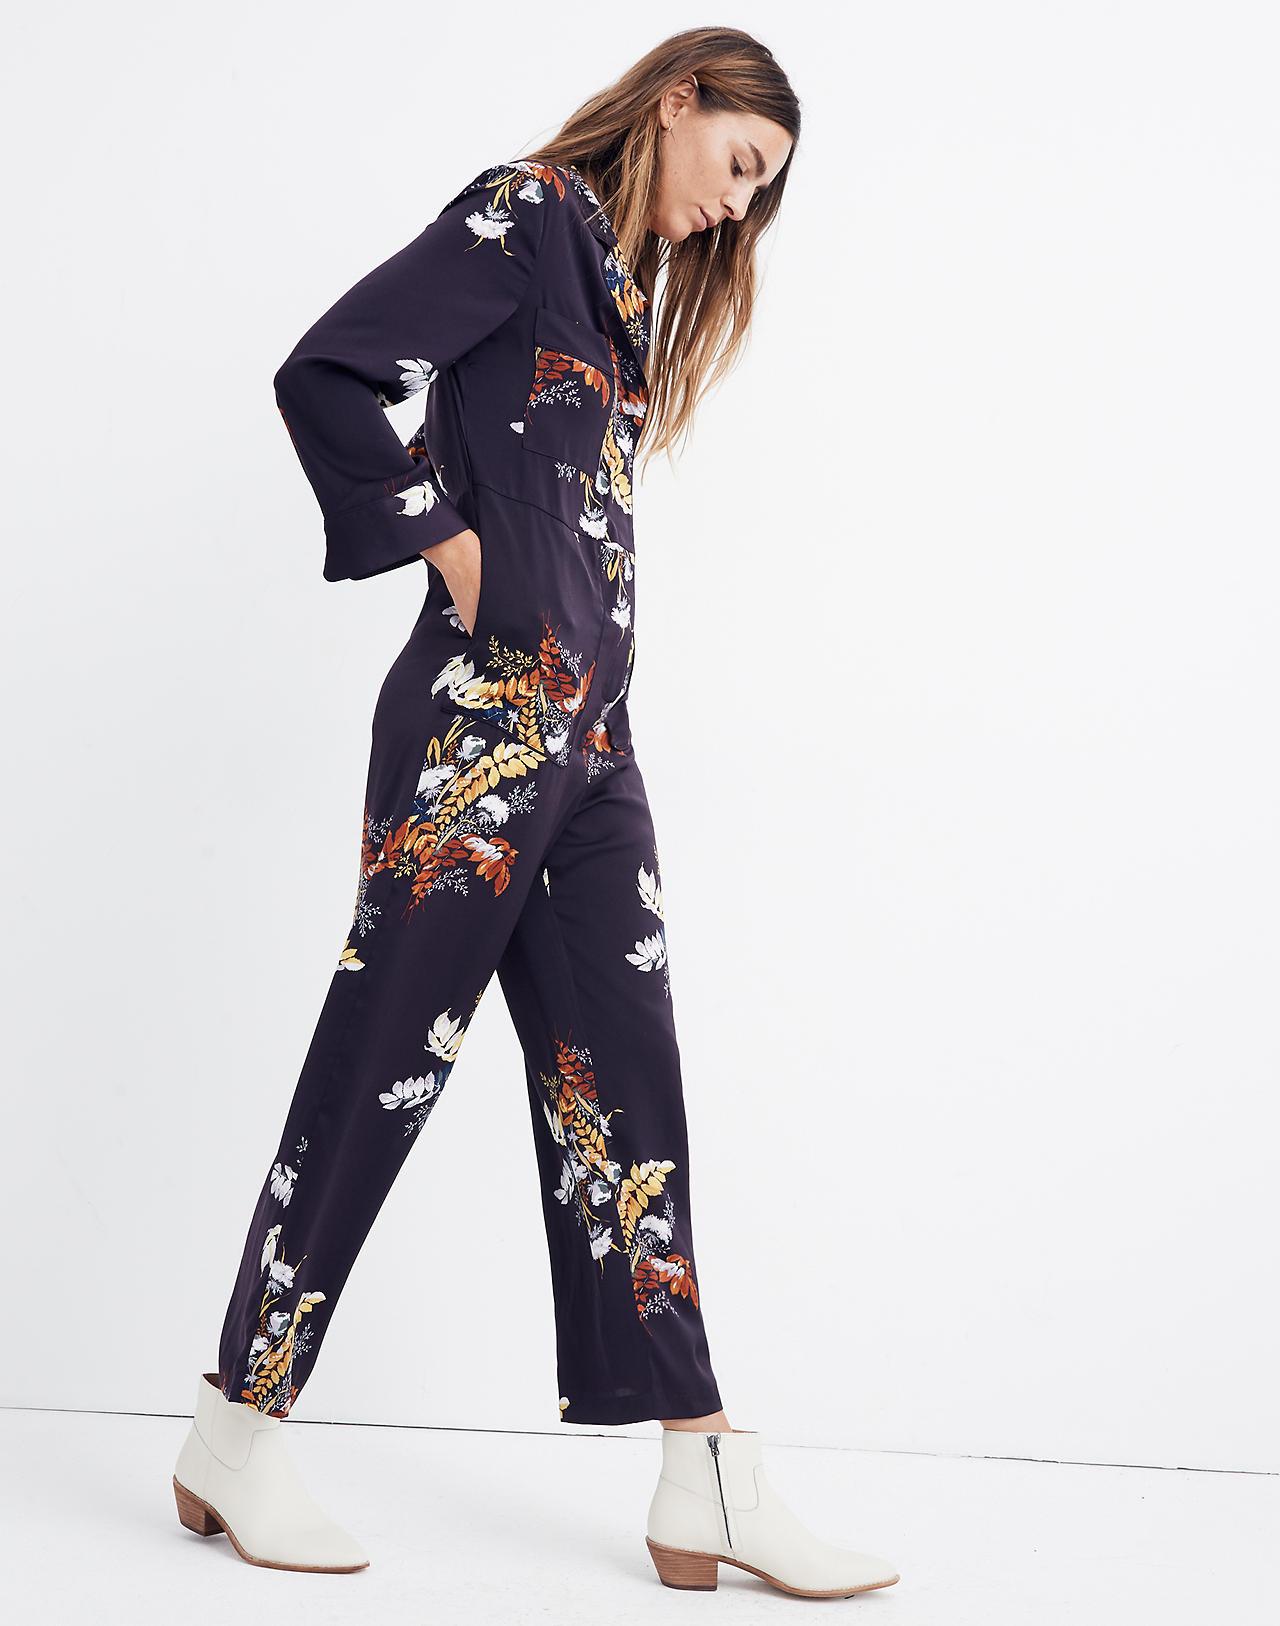 4093d8950201 Satin Pajama Jumpsuit in Blooming Oasis in harvest dark eggplant image 2